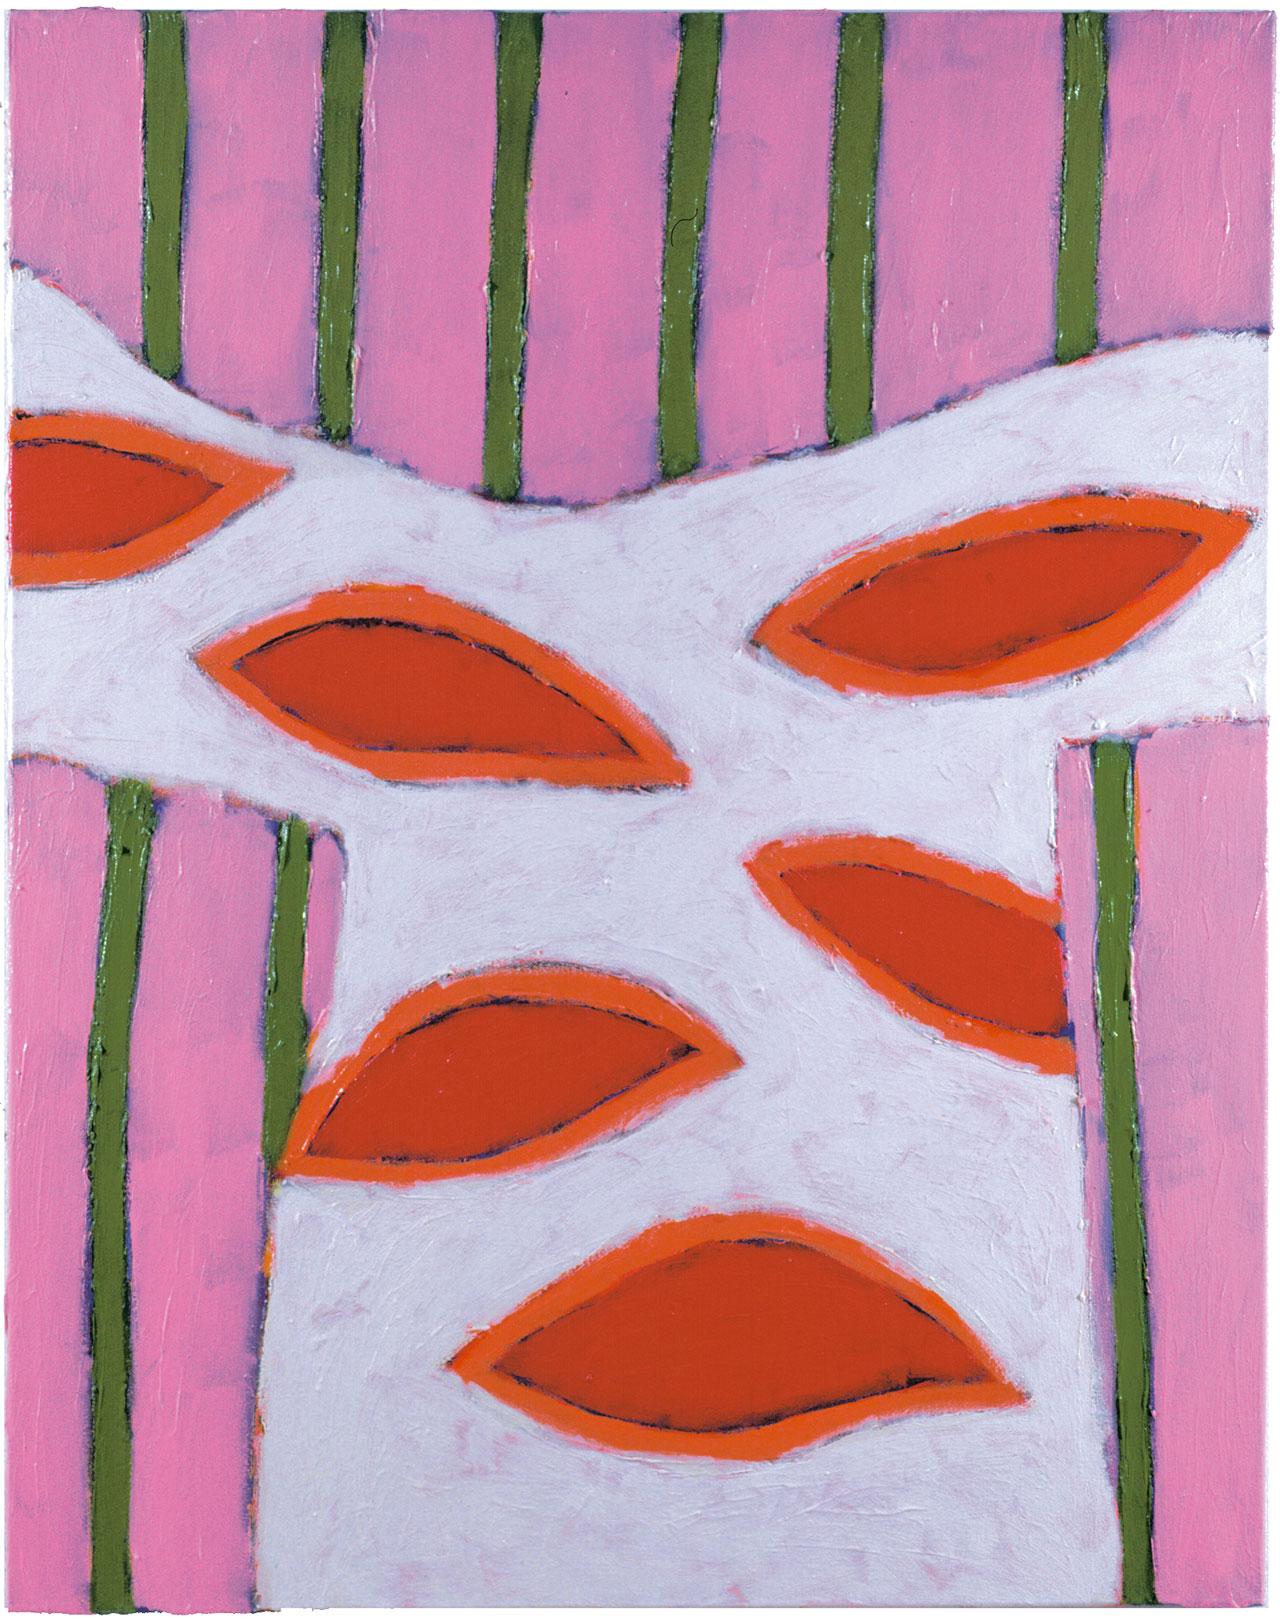 SHINY PATTERNS - GARDEN PIECES V | 2000 © Kerstin Jeckel